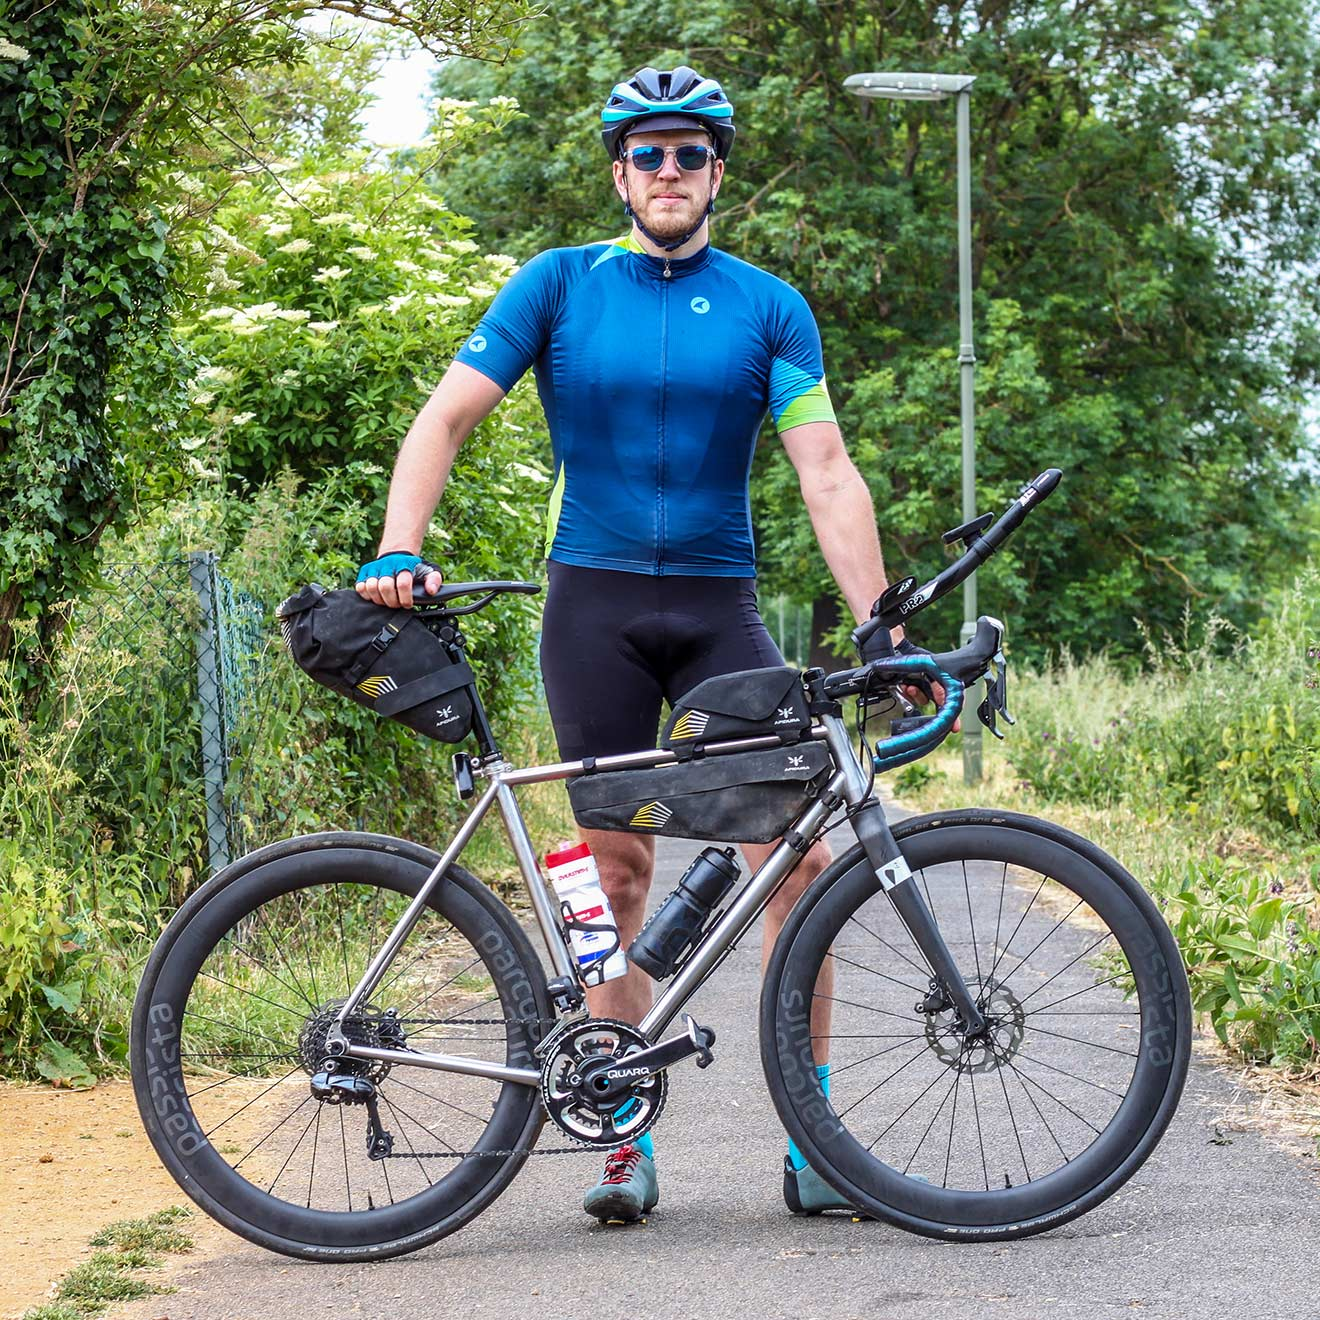 A cyclist standing next to his bike with a complete race kit: saddle bag, top tube bag, and frame bag